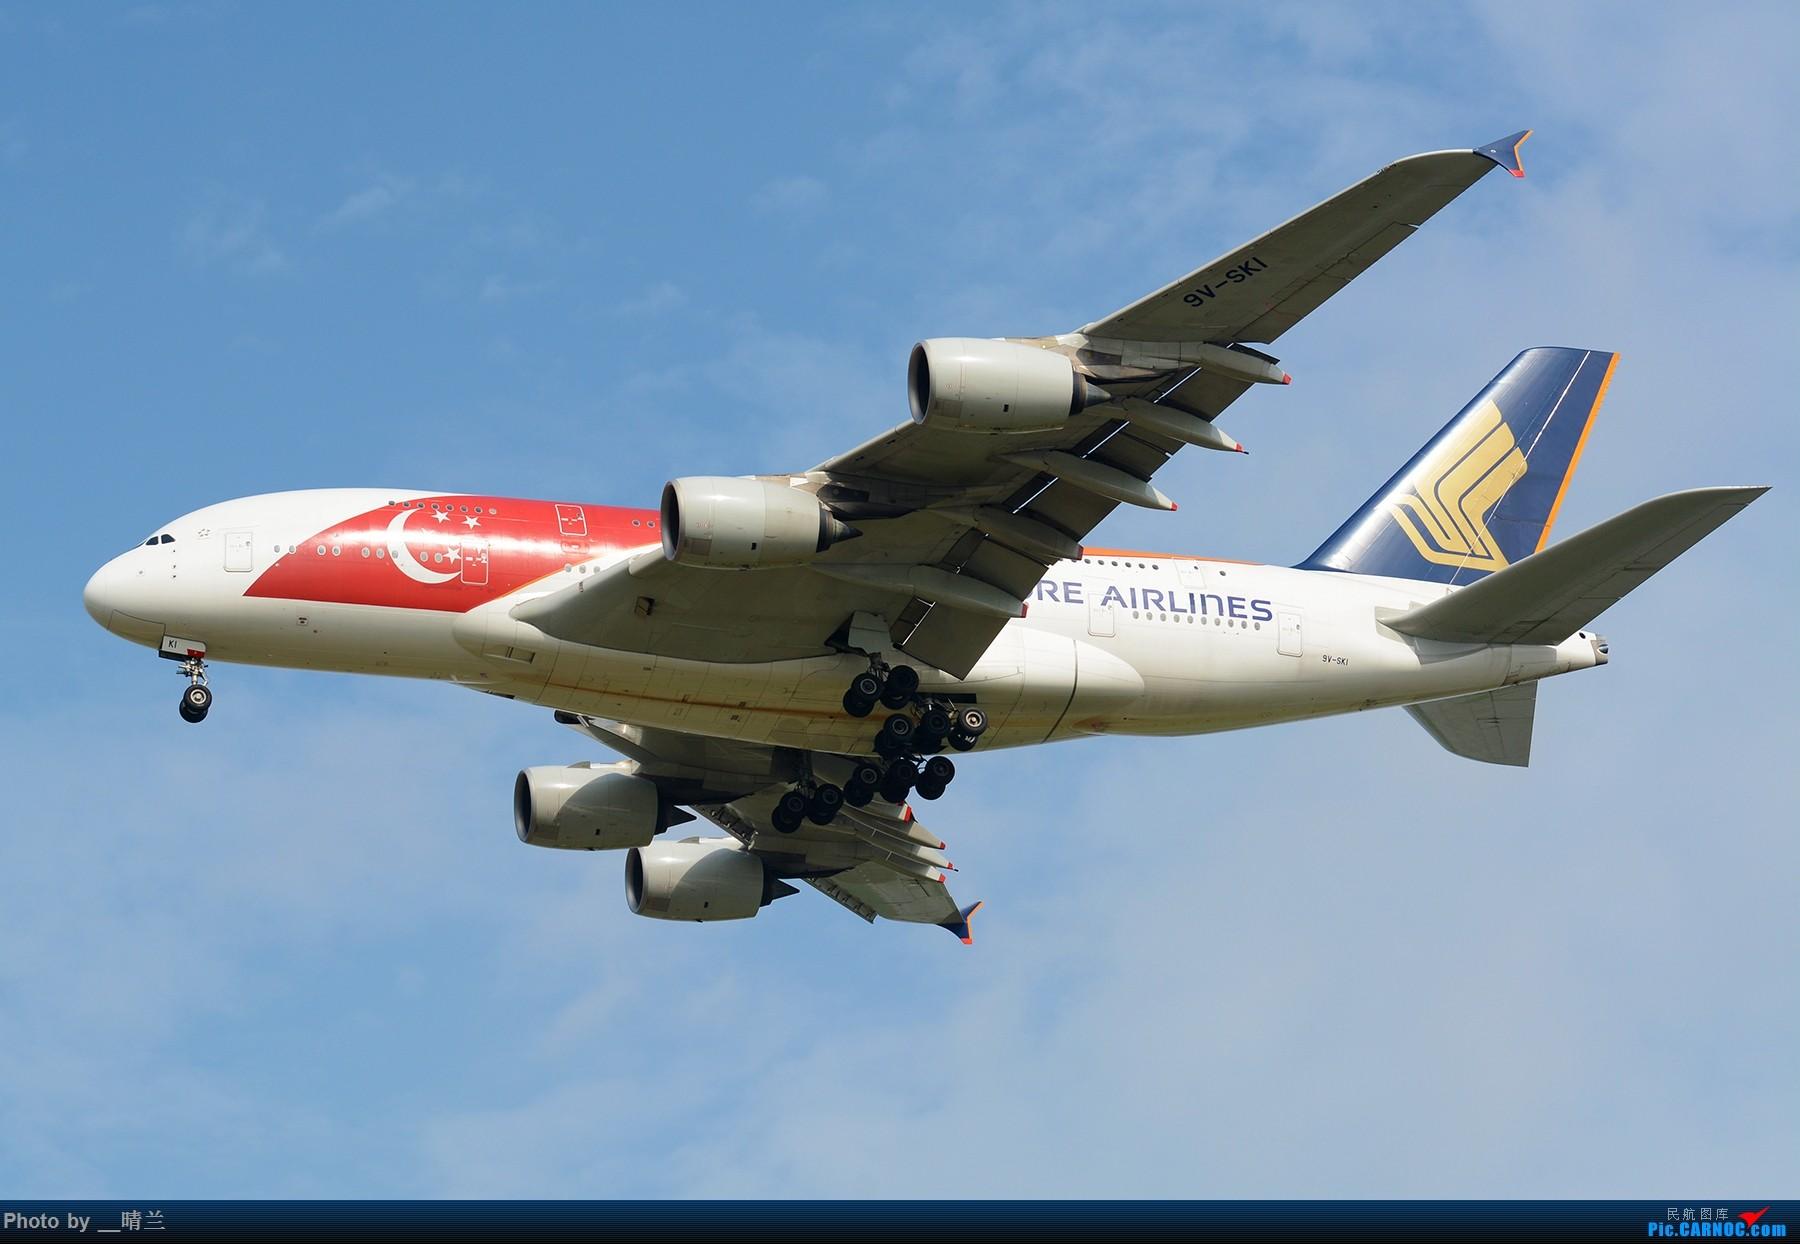 Re:[二图党]PVG-既然今天是F1新加坡大奖赛正赛,那么我们多放几只彩绘去PVG吧~~ AIRBUS A380-800 9V-SKI 中国上海浦东国际机场